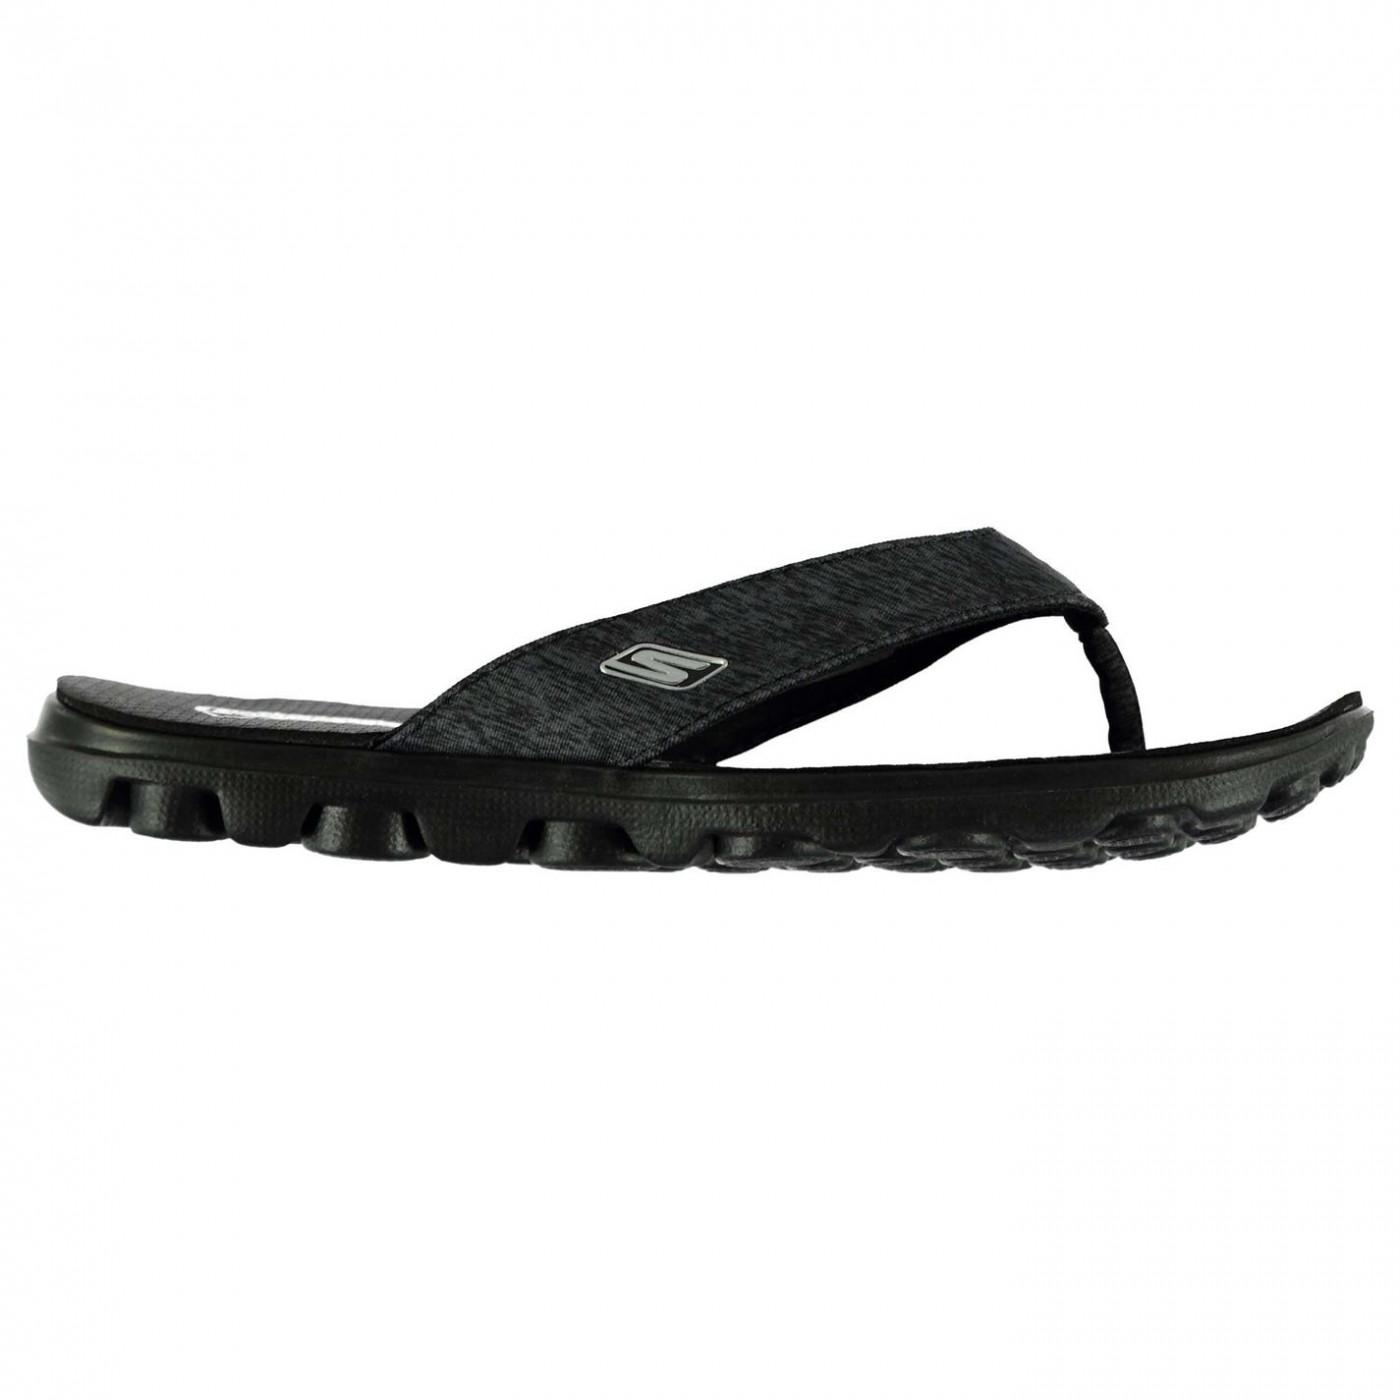 skechers on the go flow womens flip-flops